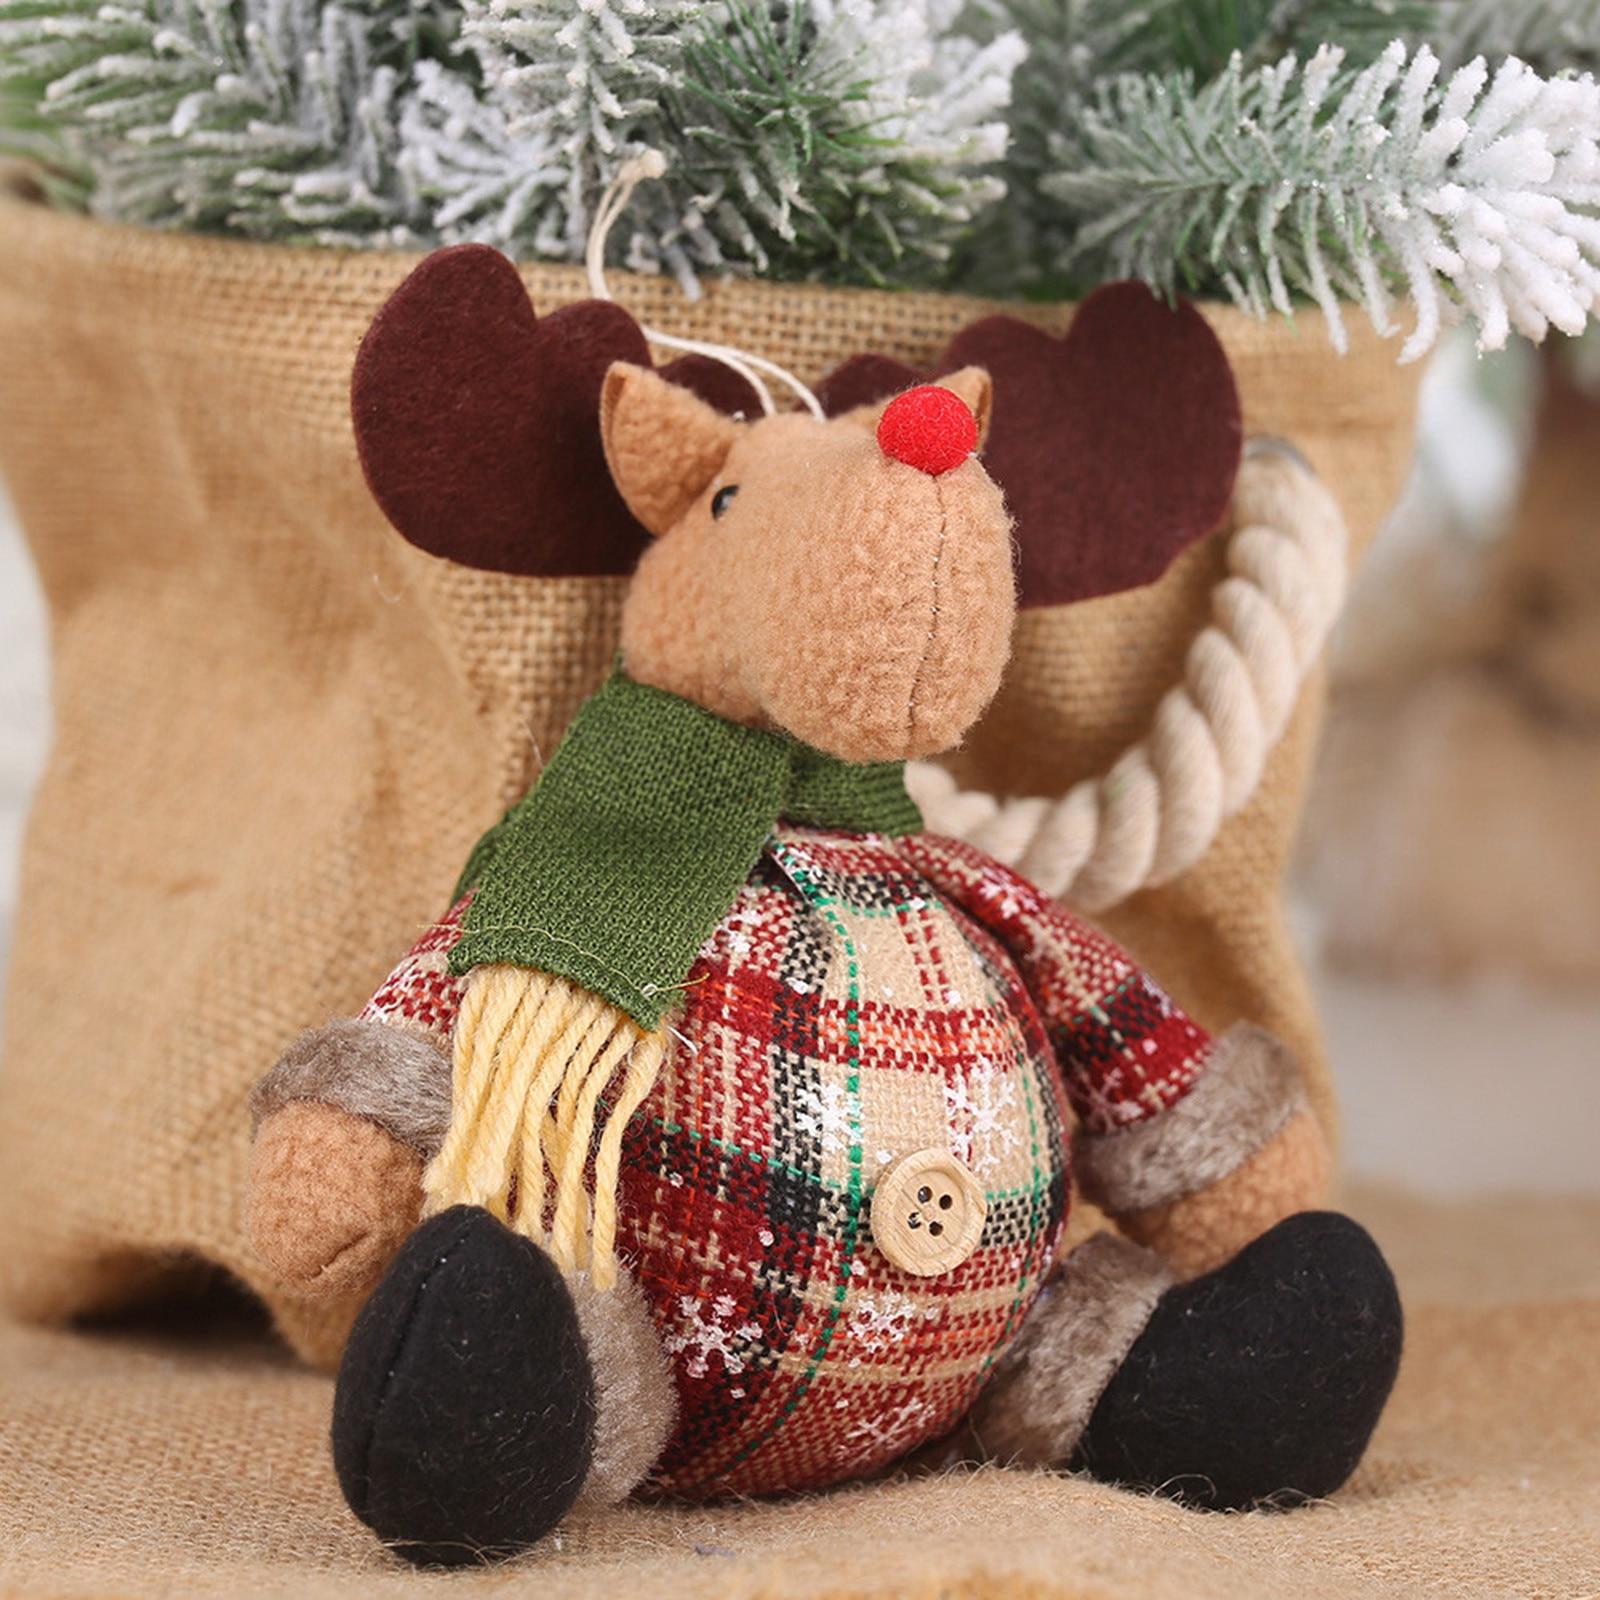 Santa Claus Kawaii Ornaments Plaid Cloth Buttons Spherical Miniature Christmas Ornaments Snowman Shaped Elk Ornaments Plush Toys